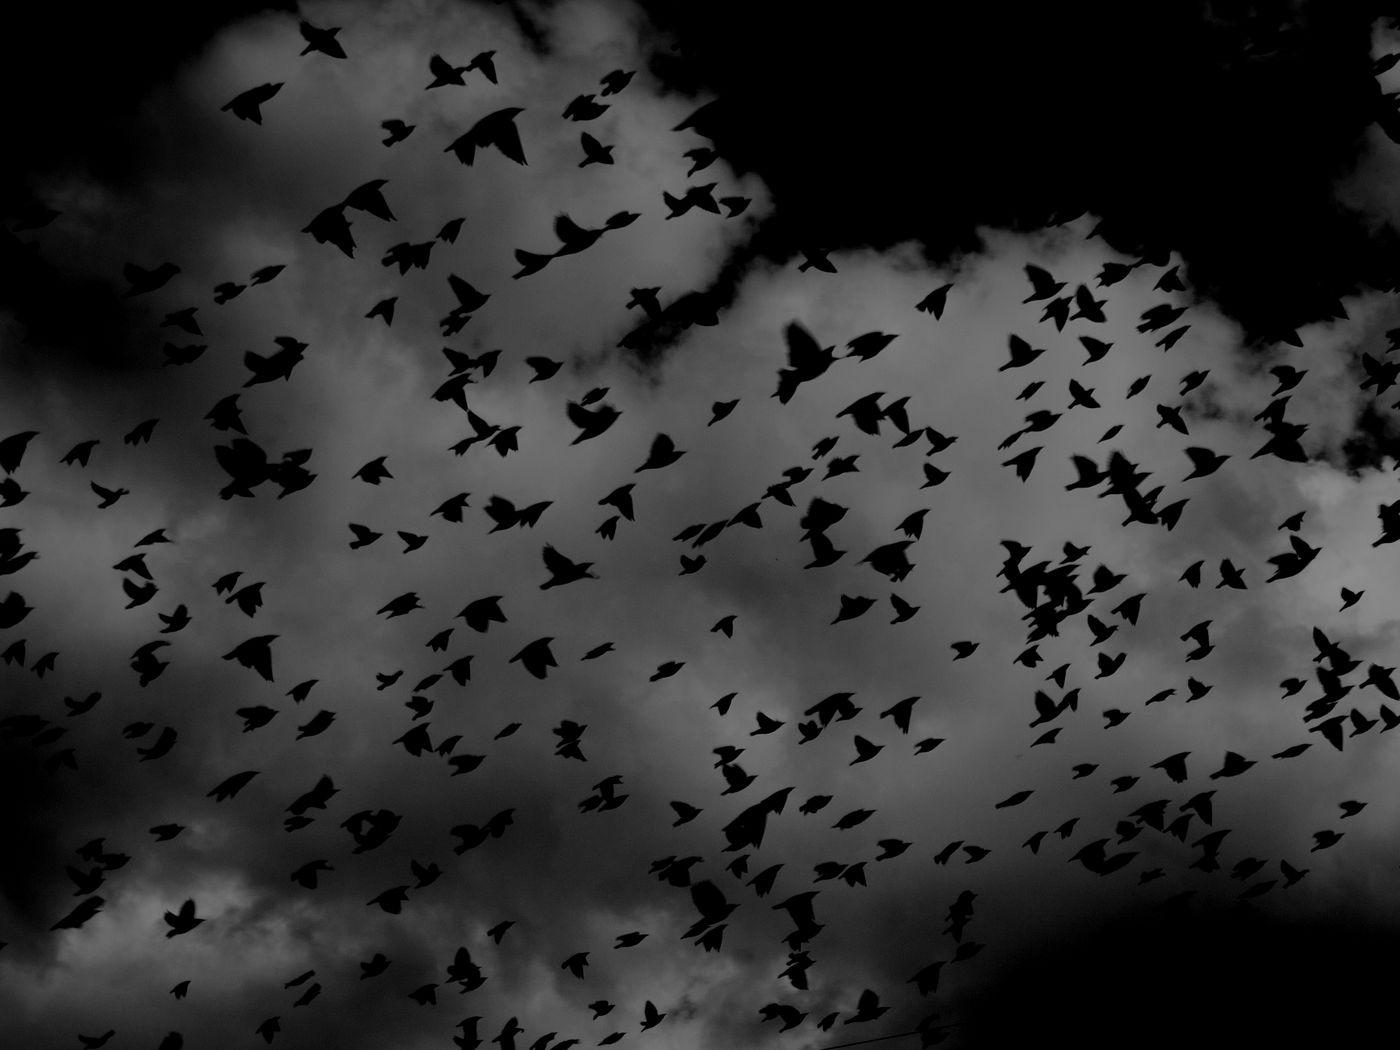 1400x1050 Wallpaper birds, flock, dark, clouds, sky